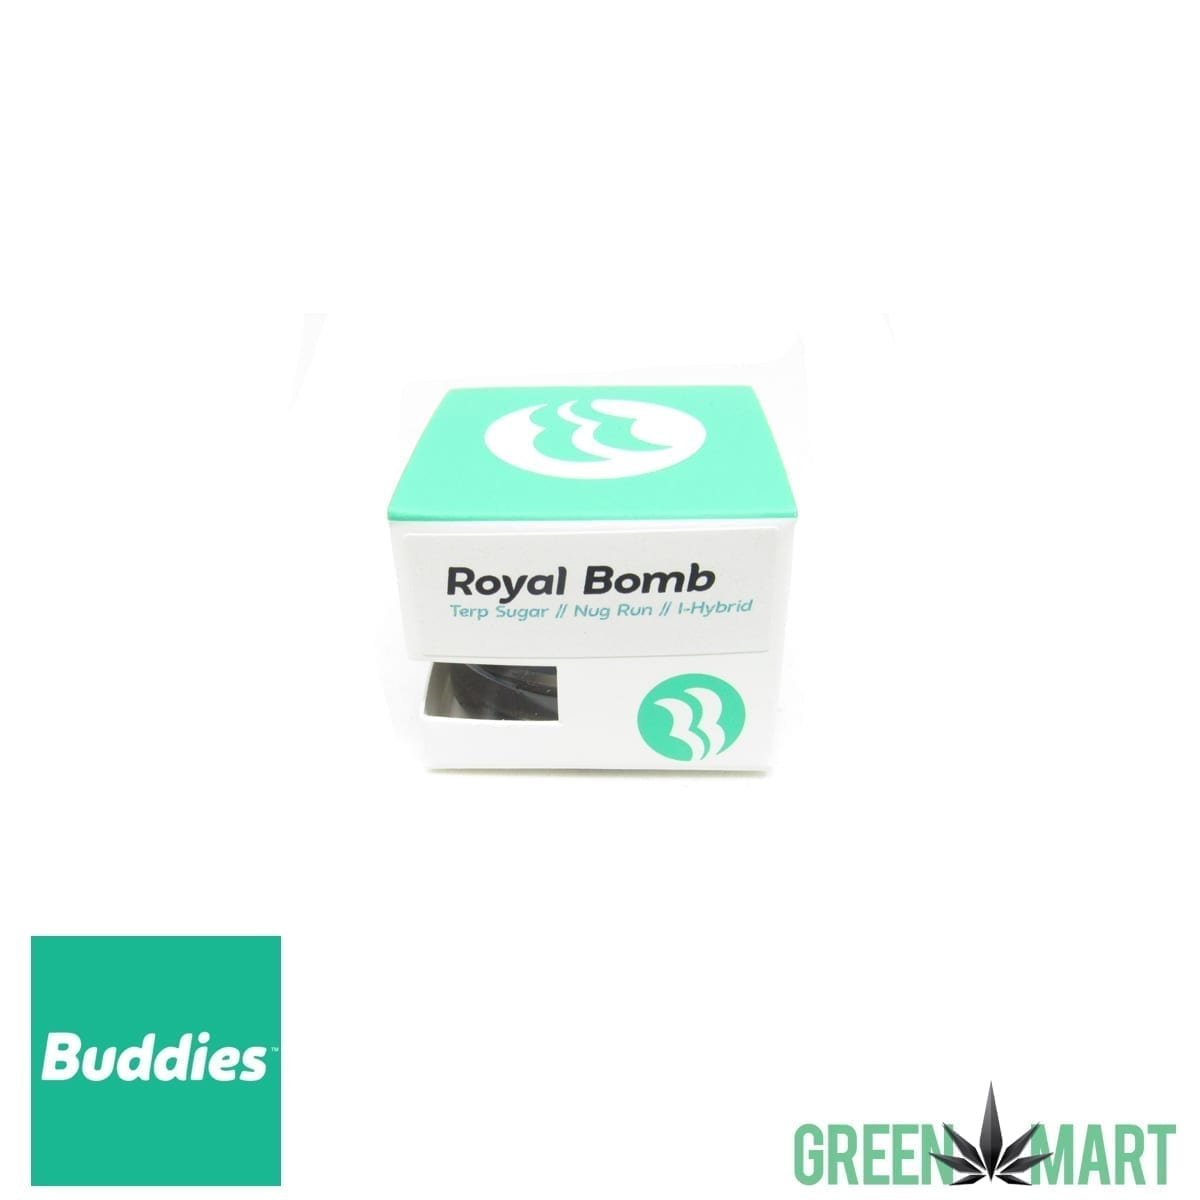 Buddies Brand Terp Sugar - Royal Bomb